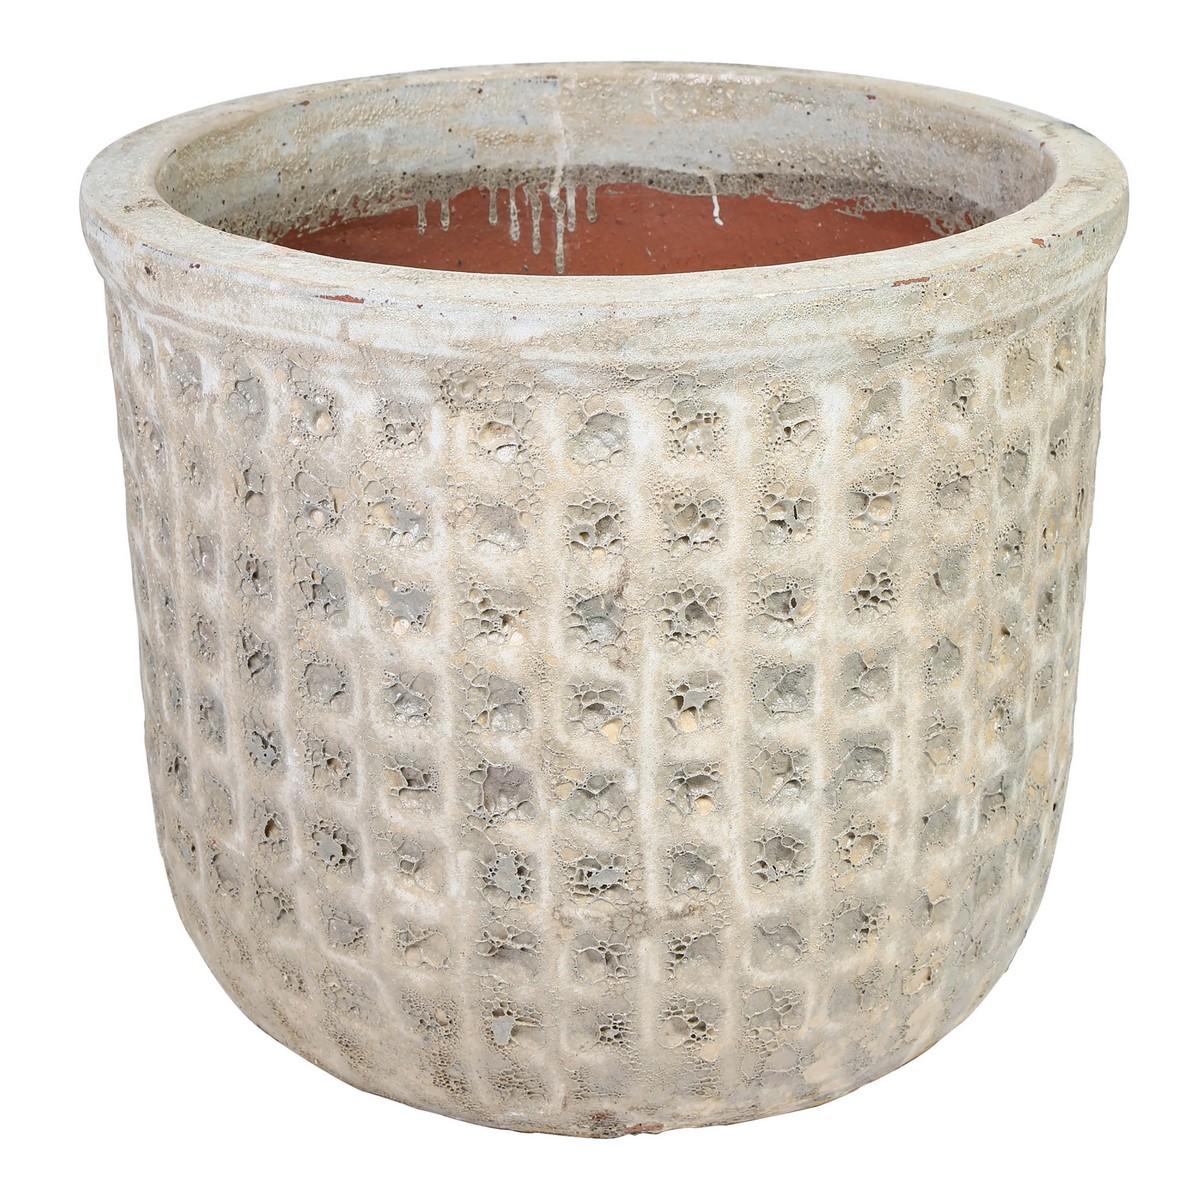 PTMD/Seco Antique white ceramic Pot/681491【01】【取寄】